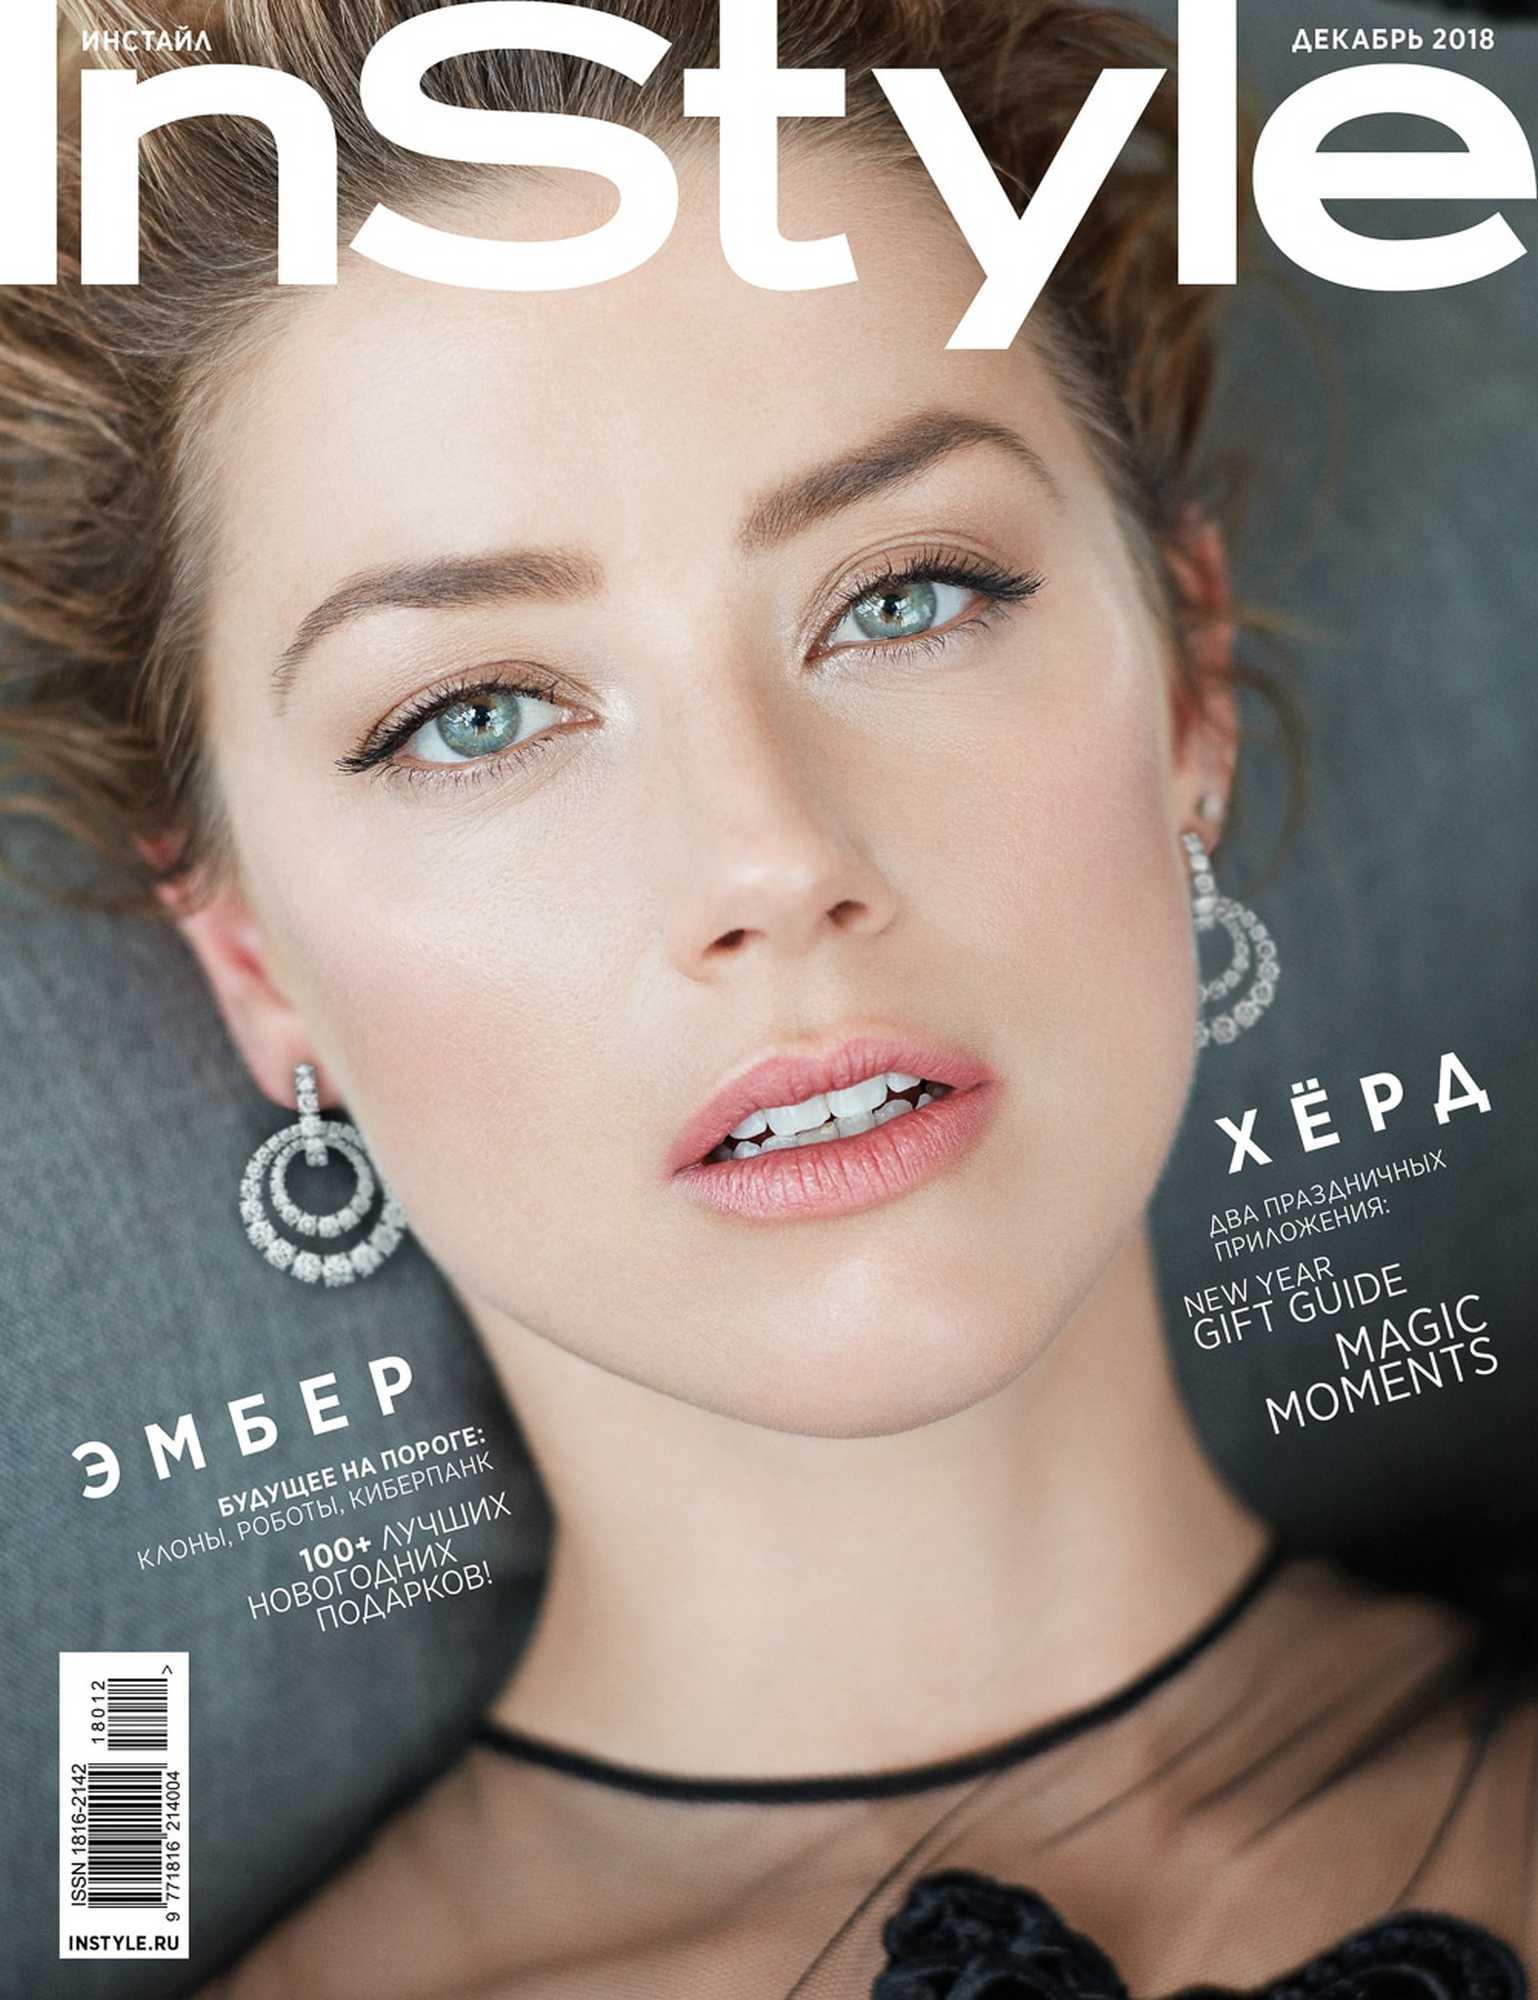 Amber-Heard-InStyle-Russia-December-20181.jpg